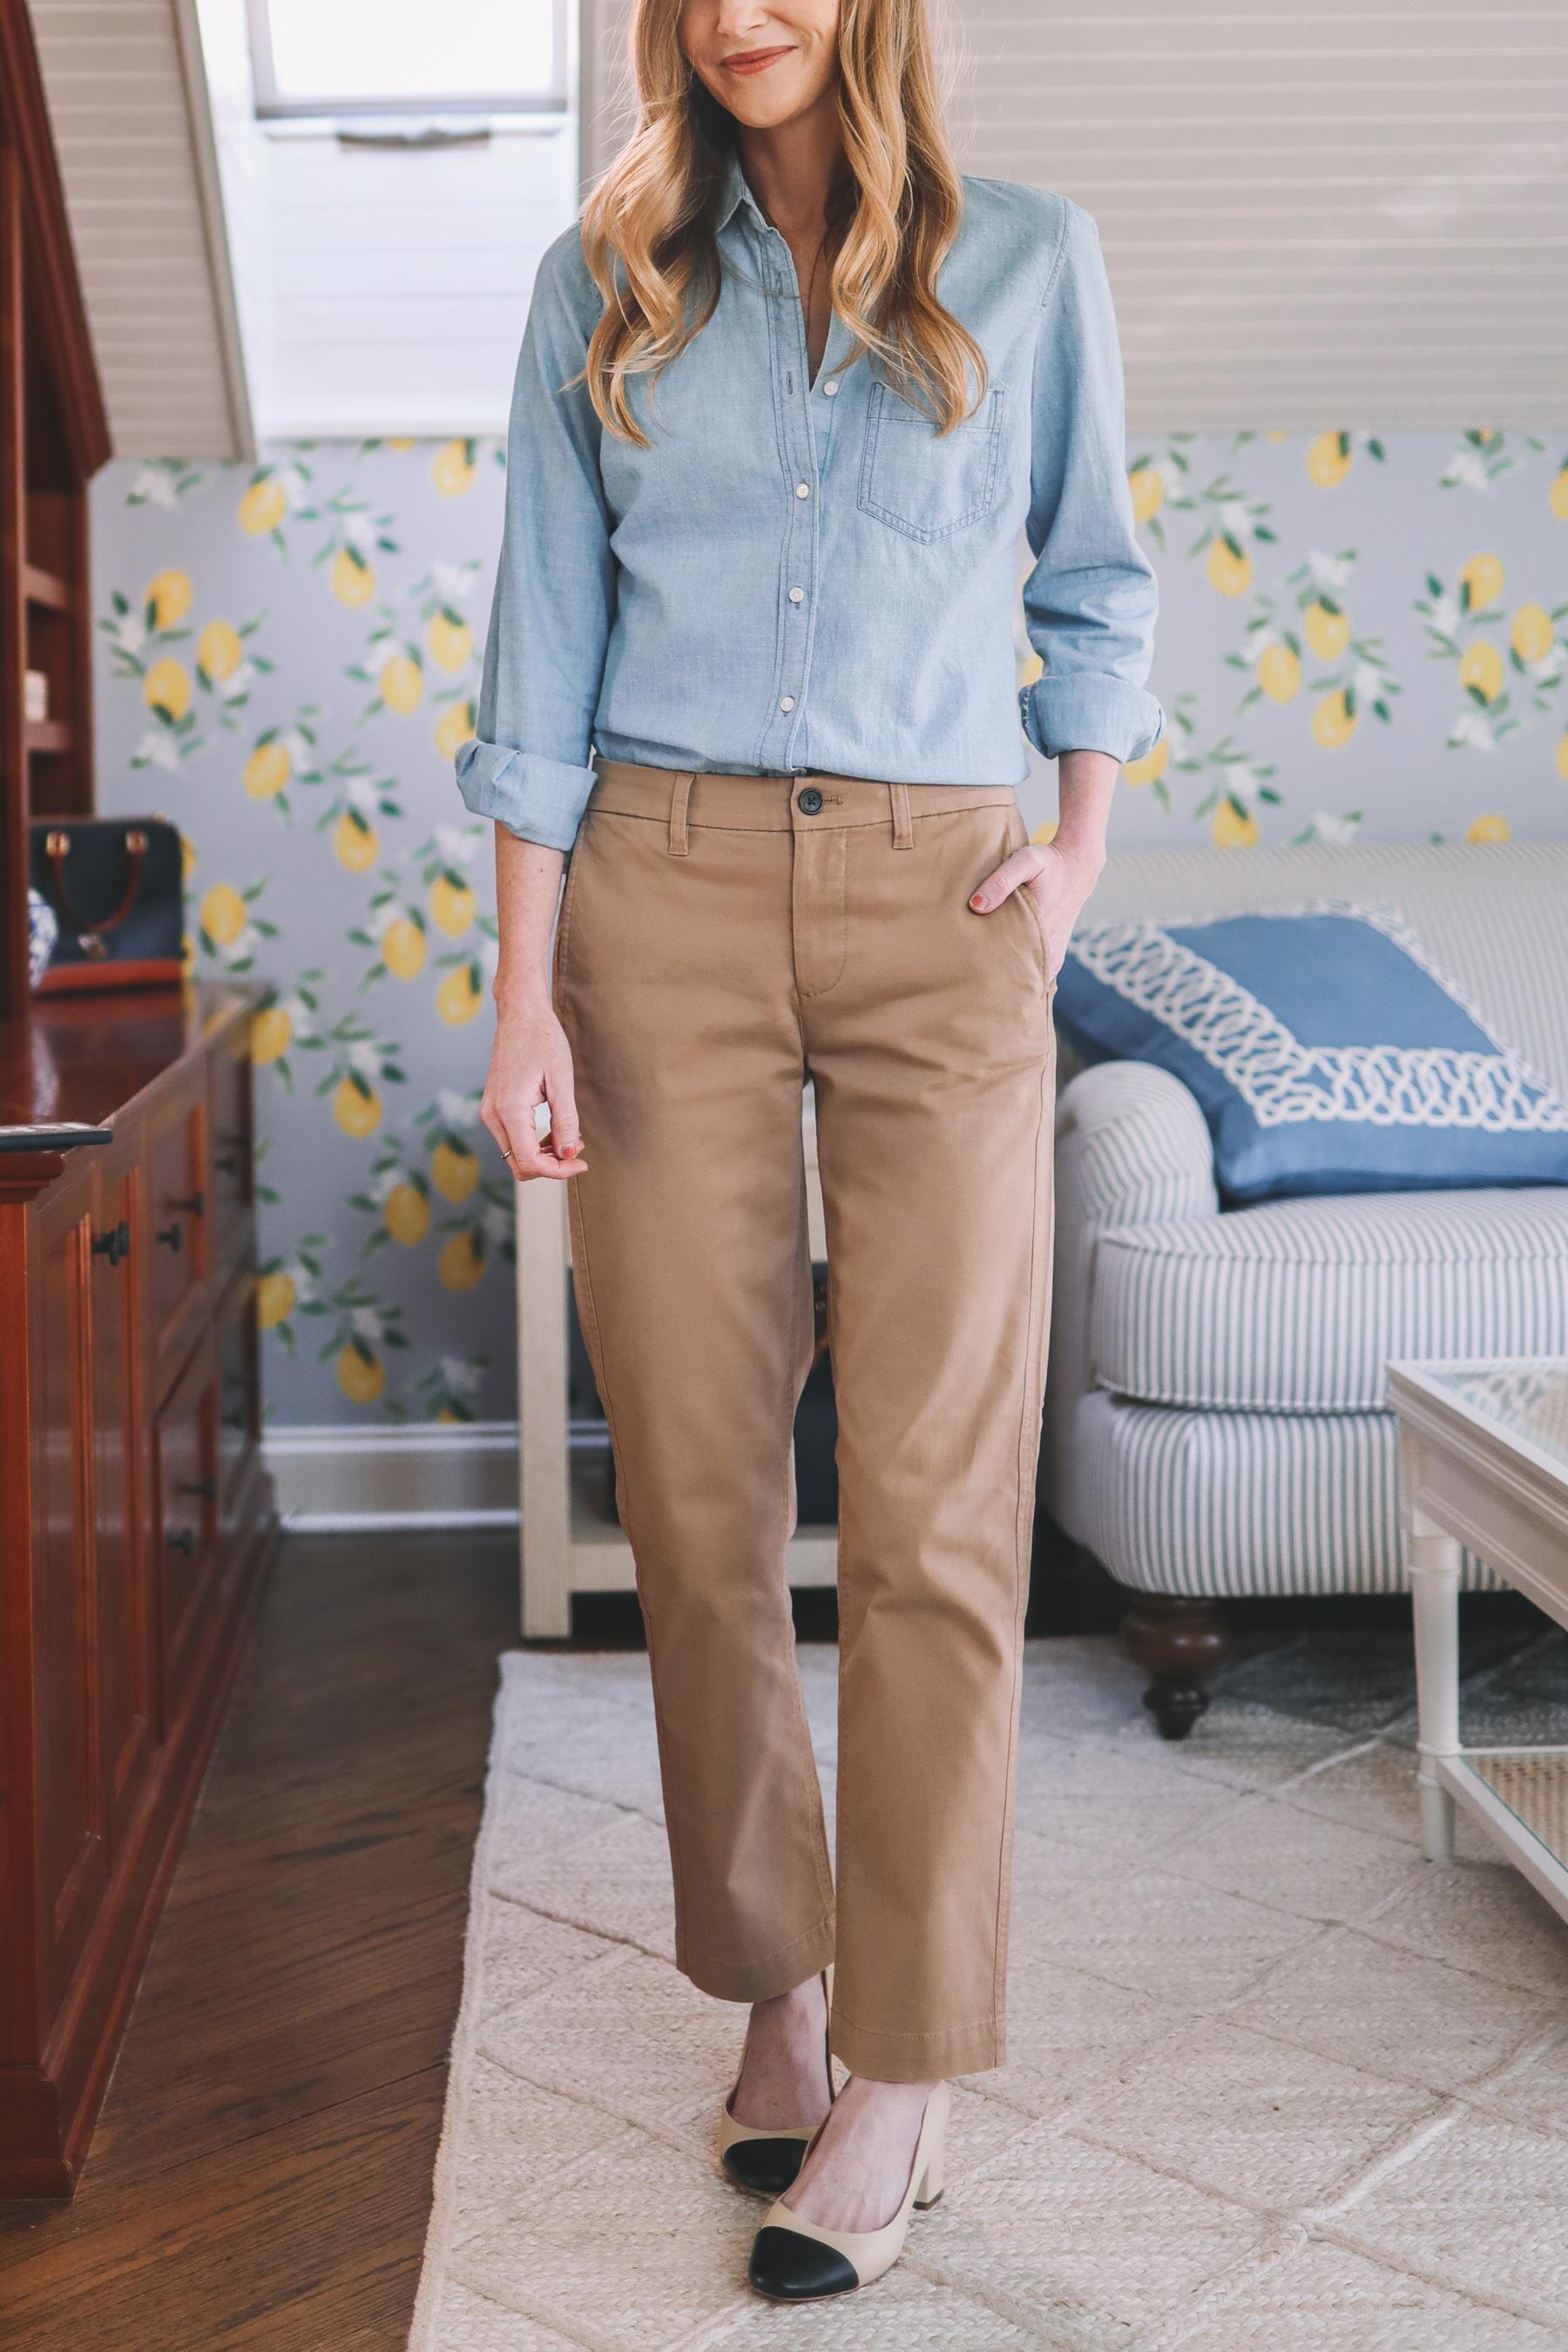 High-Rise Khaki Pants styled 3 ways